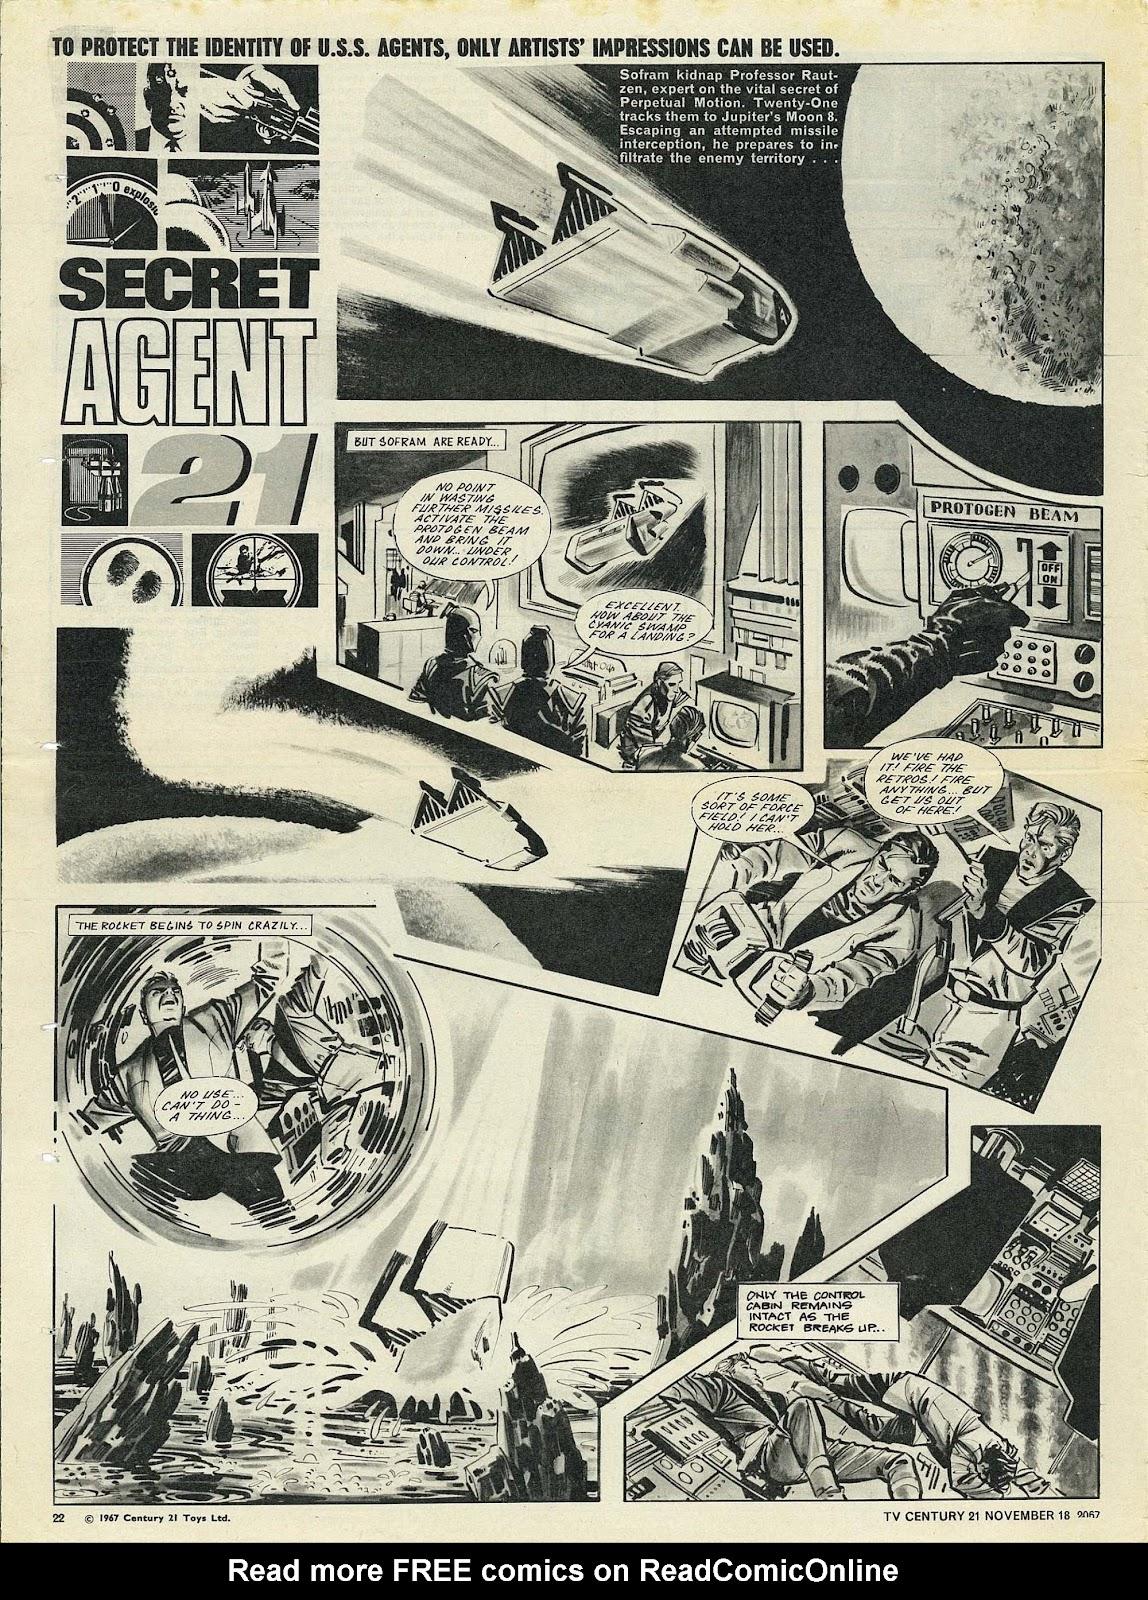 TV Century 21 (TV 21) issue 148 - Page 21